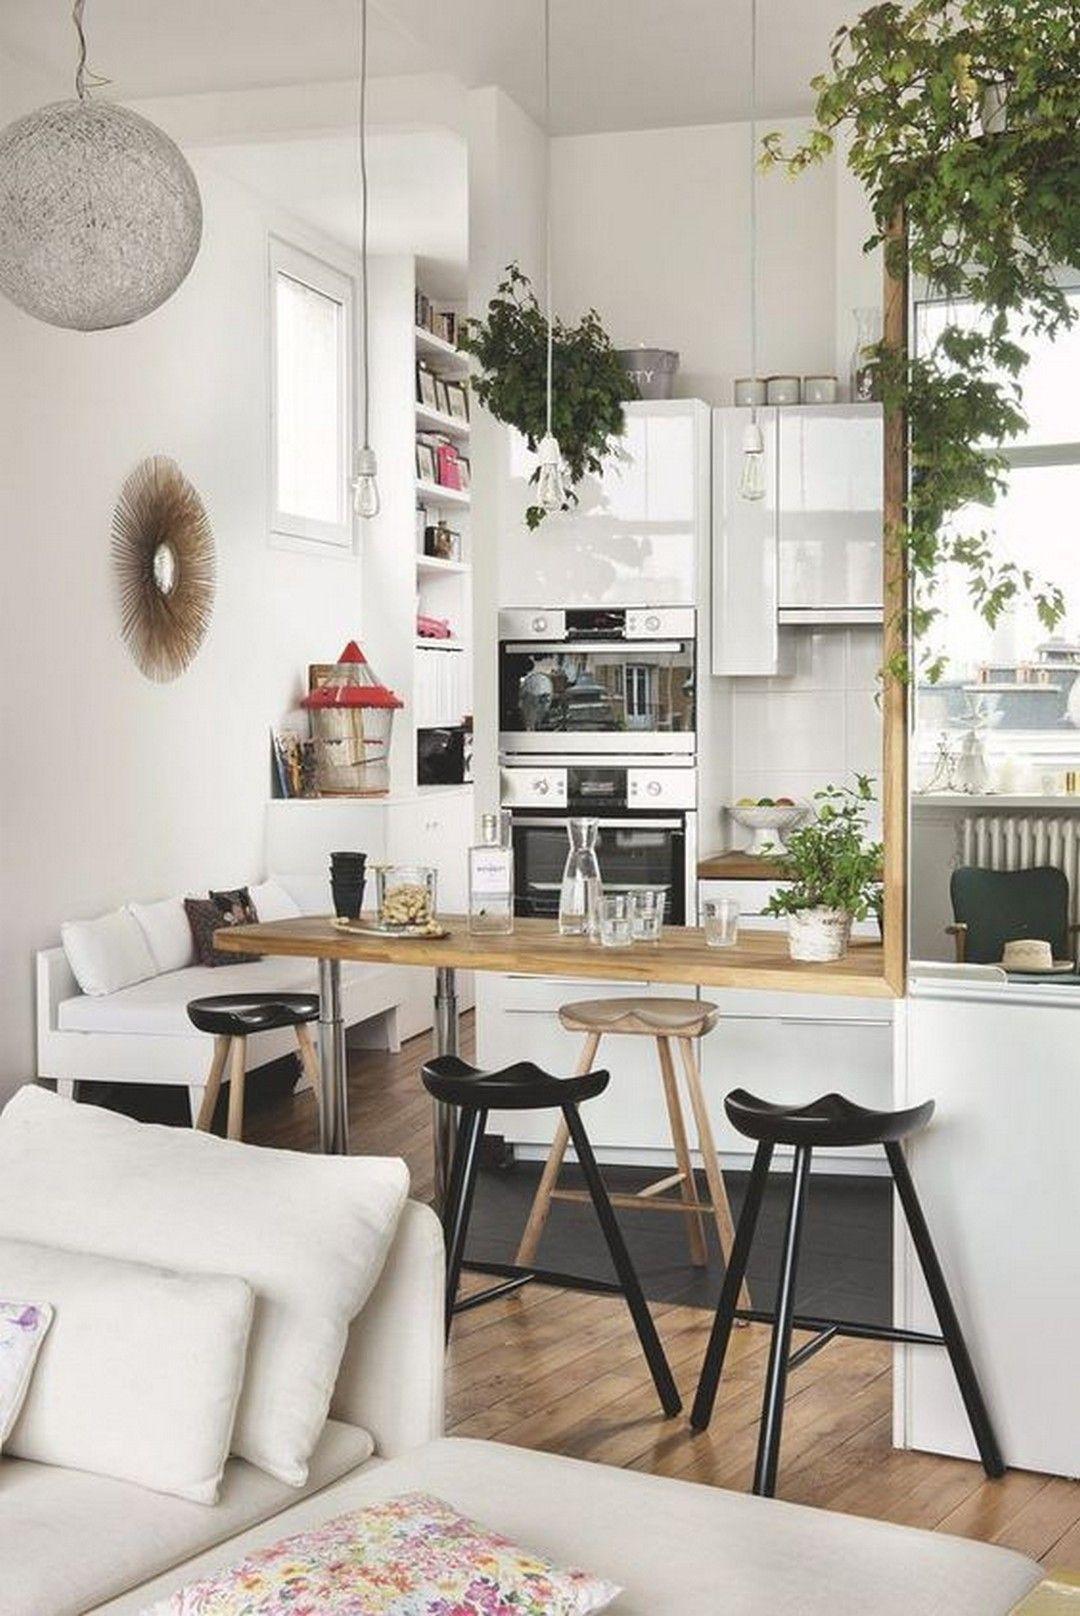 26 Smart Ways To Make Small Kitchen Look More Bigger Interer